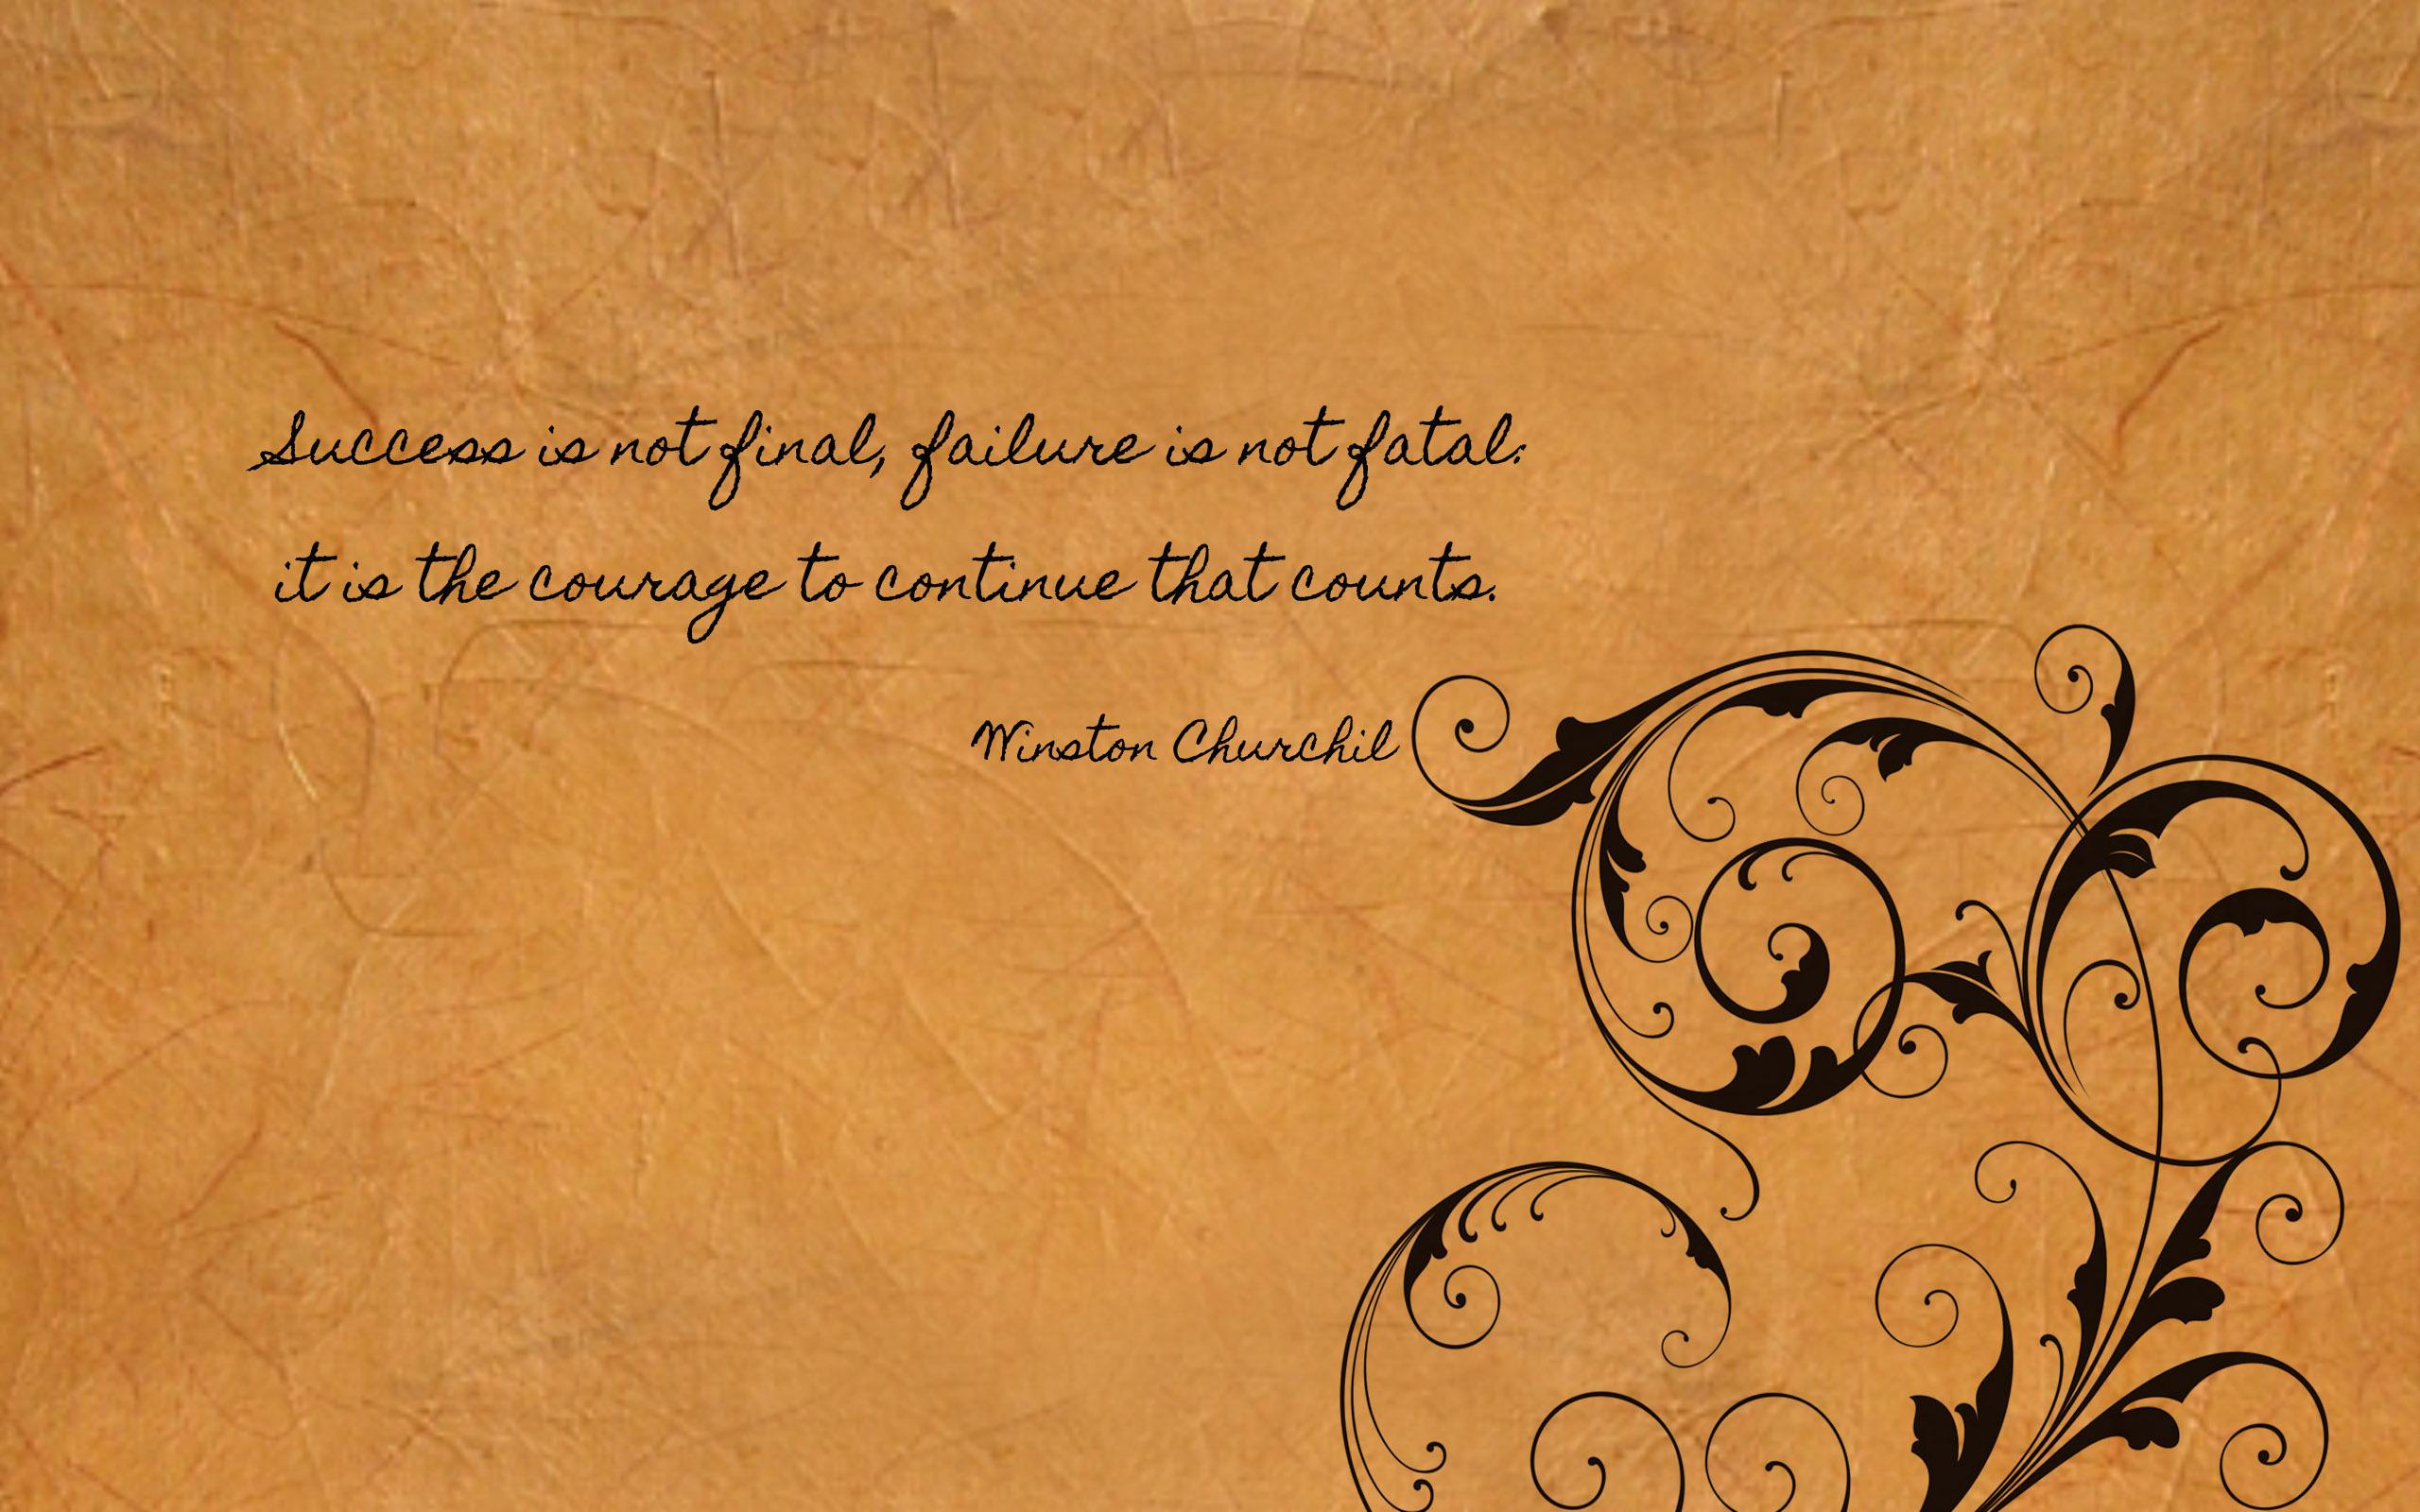 Inspirational Quotes About Failure: Motivational Quotes Failure. QuotesGram